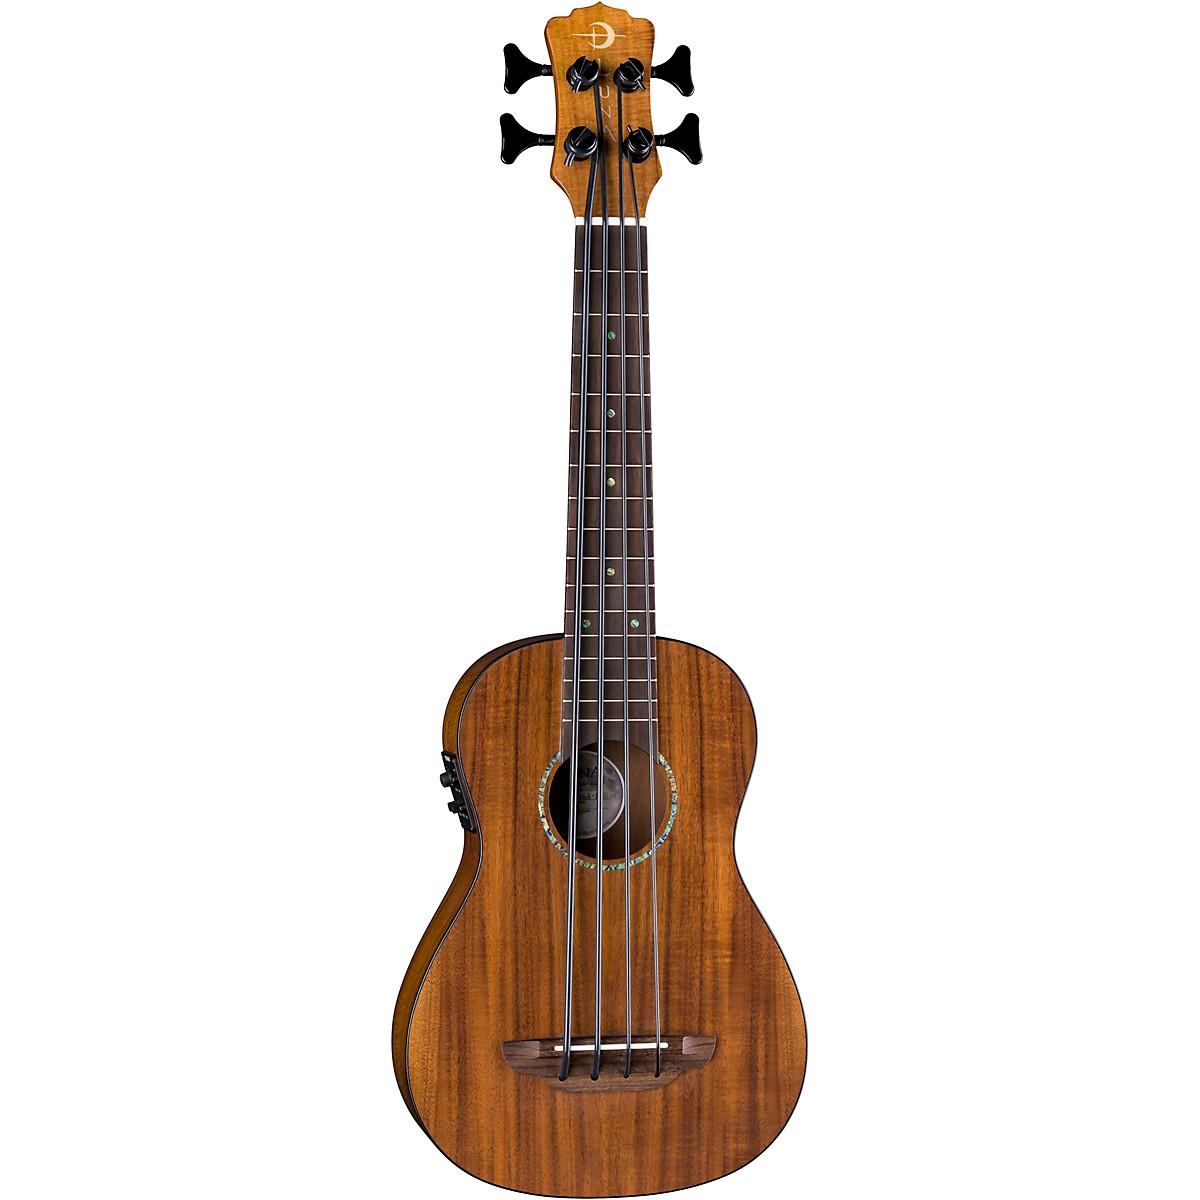 Luna Guitars Bari-Bass Koa Acoustic-Electric Ukulele